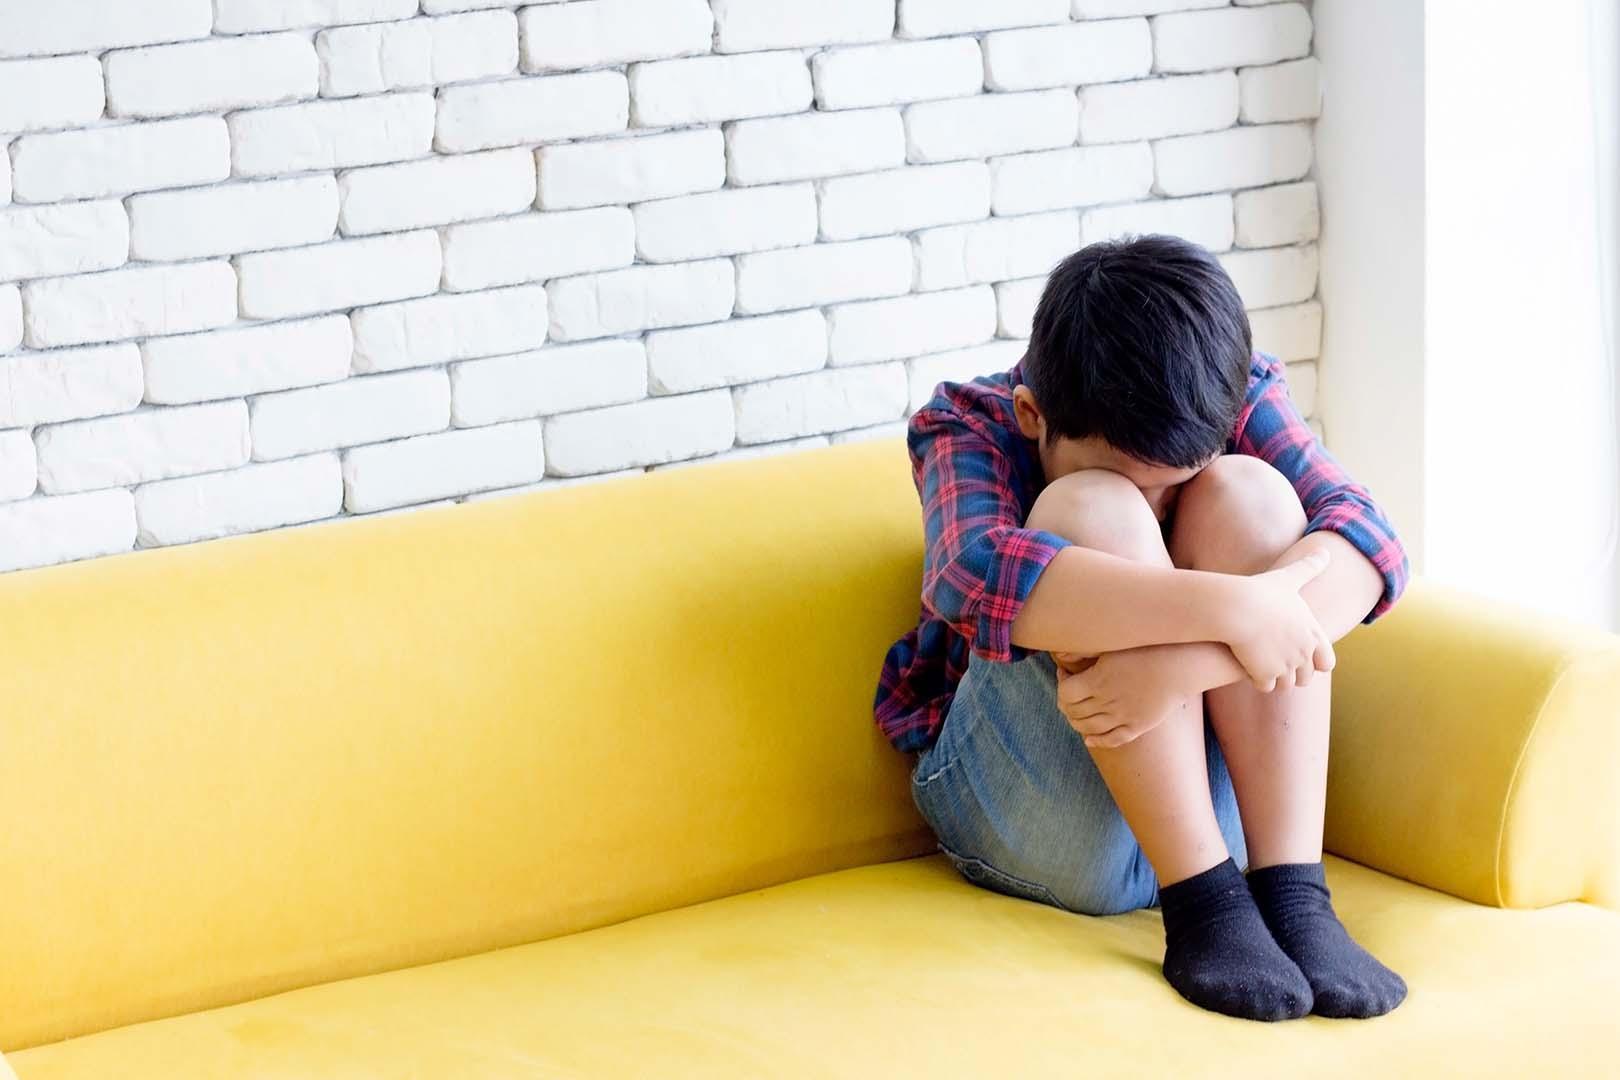 Mengenal Autism Spectrum Disorder (ASD) | Lifepack.id